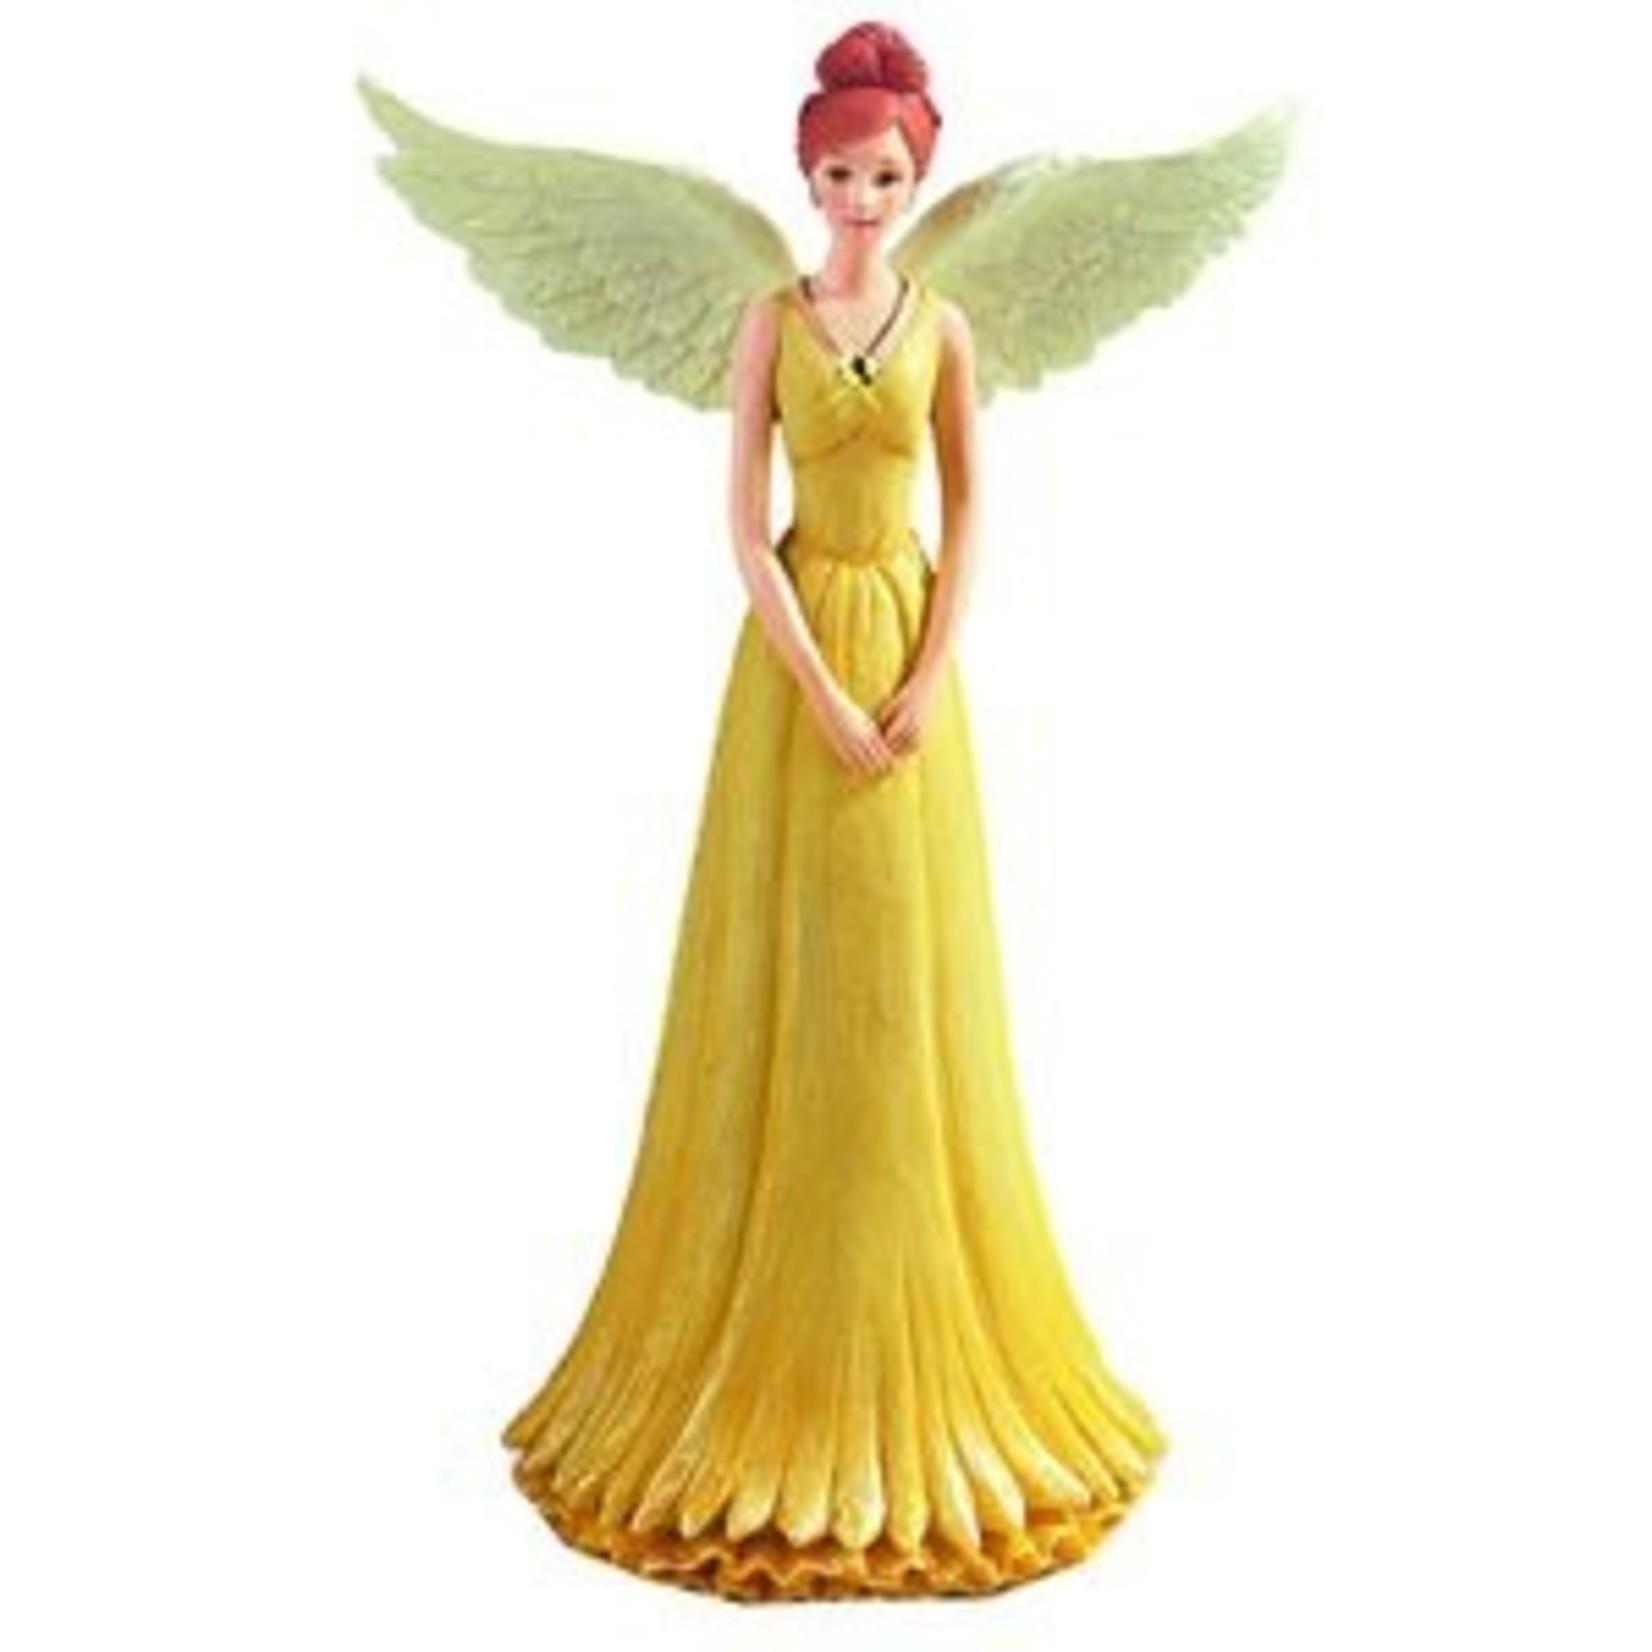 Angel Figurine August -Birthstone